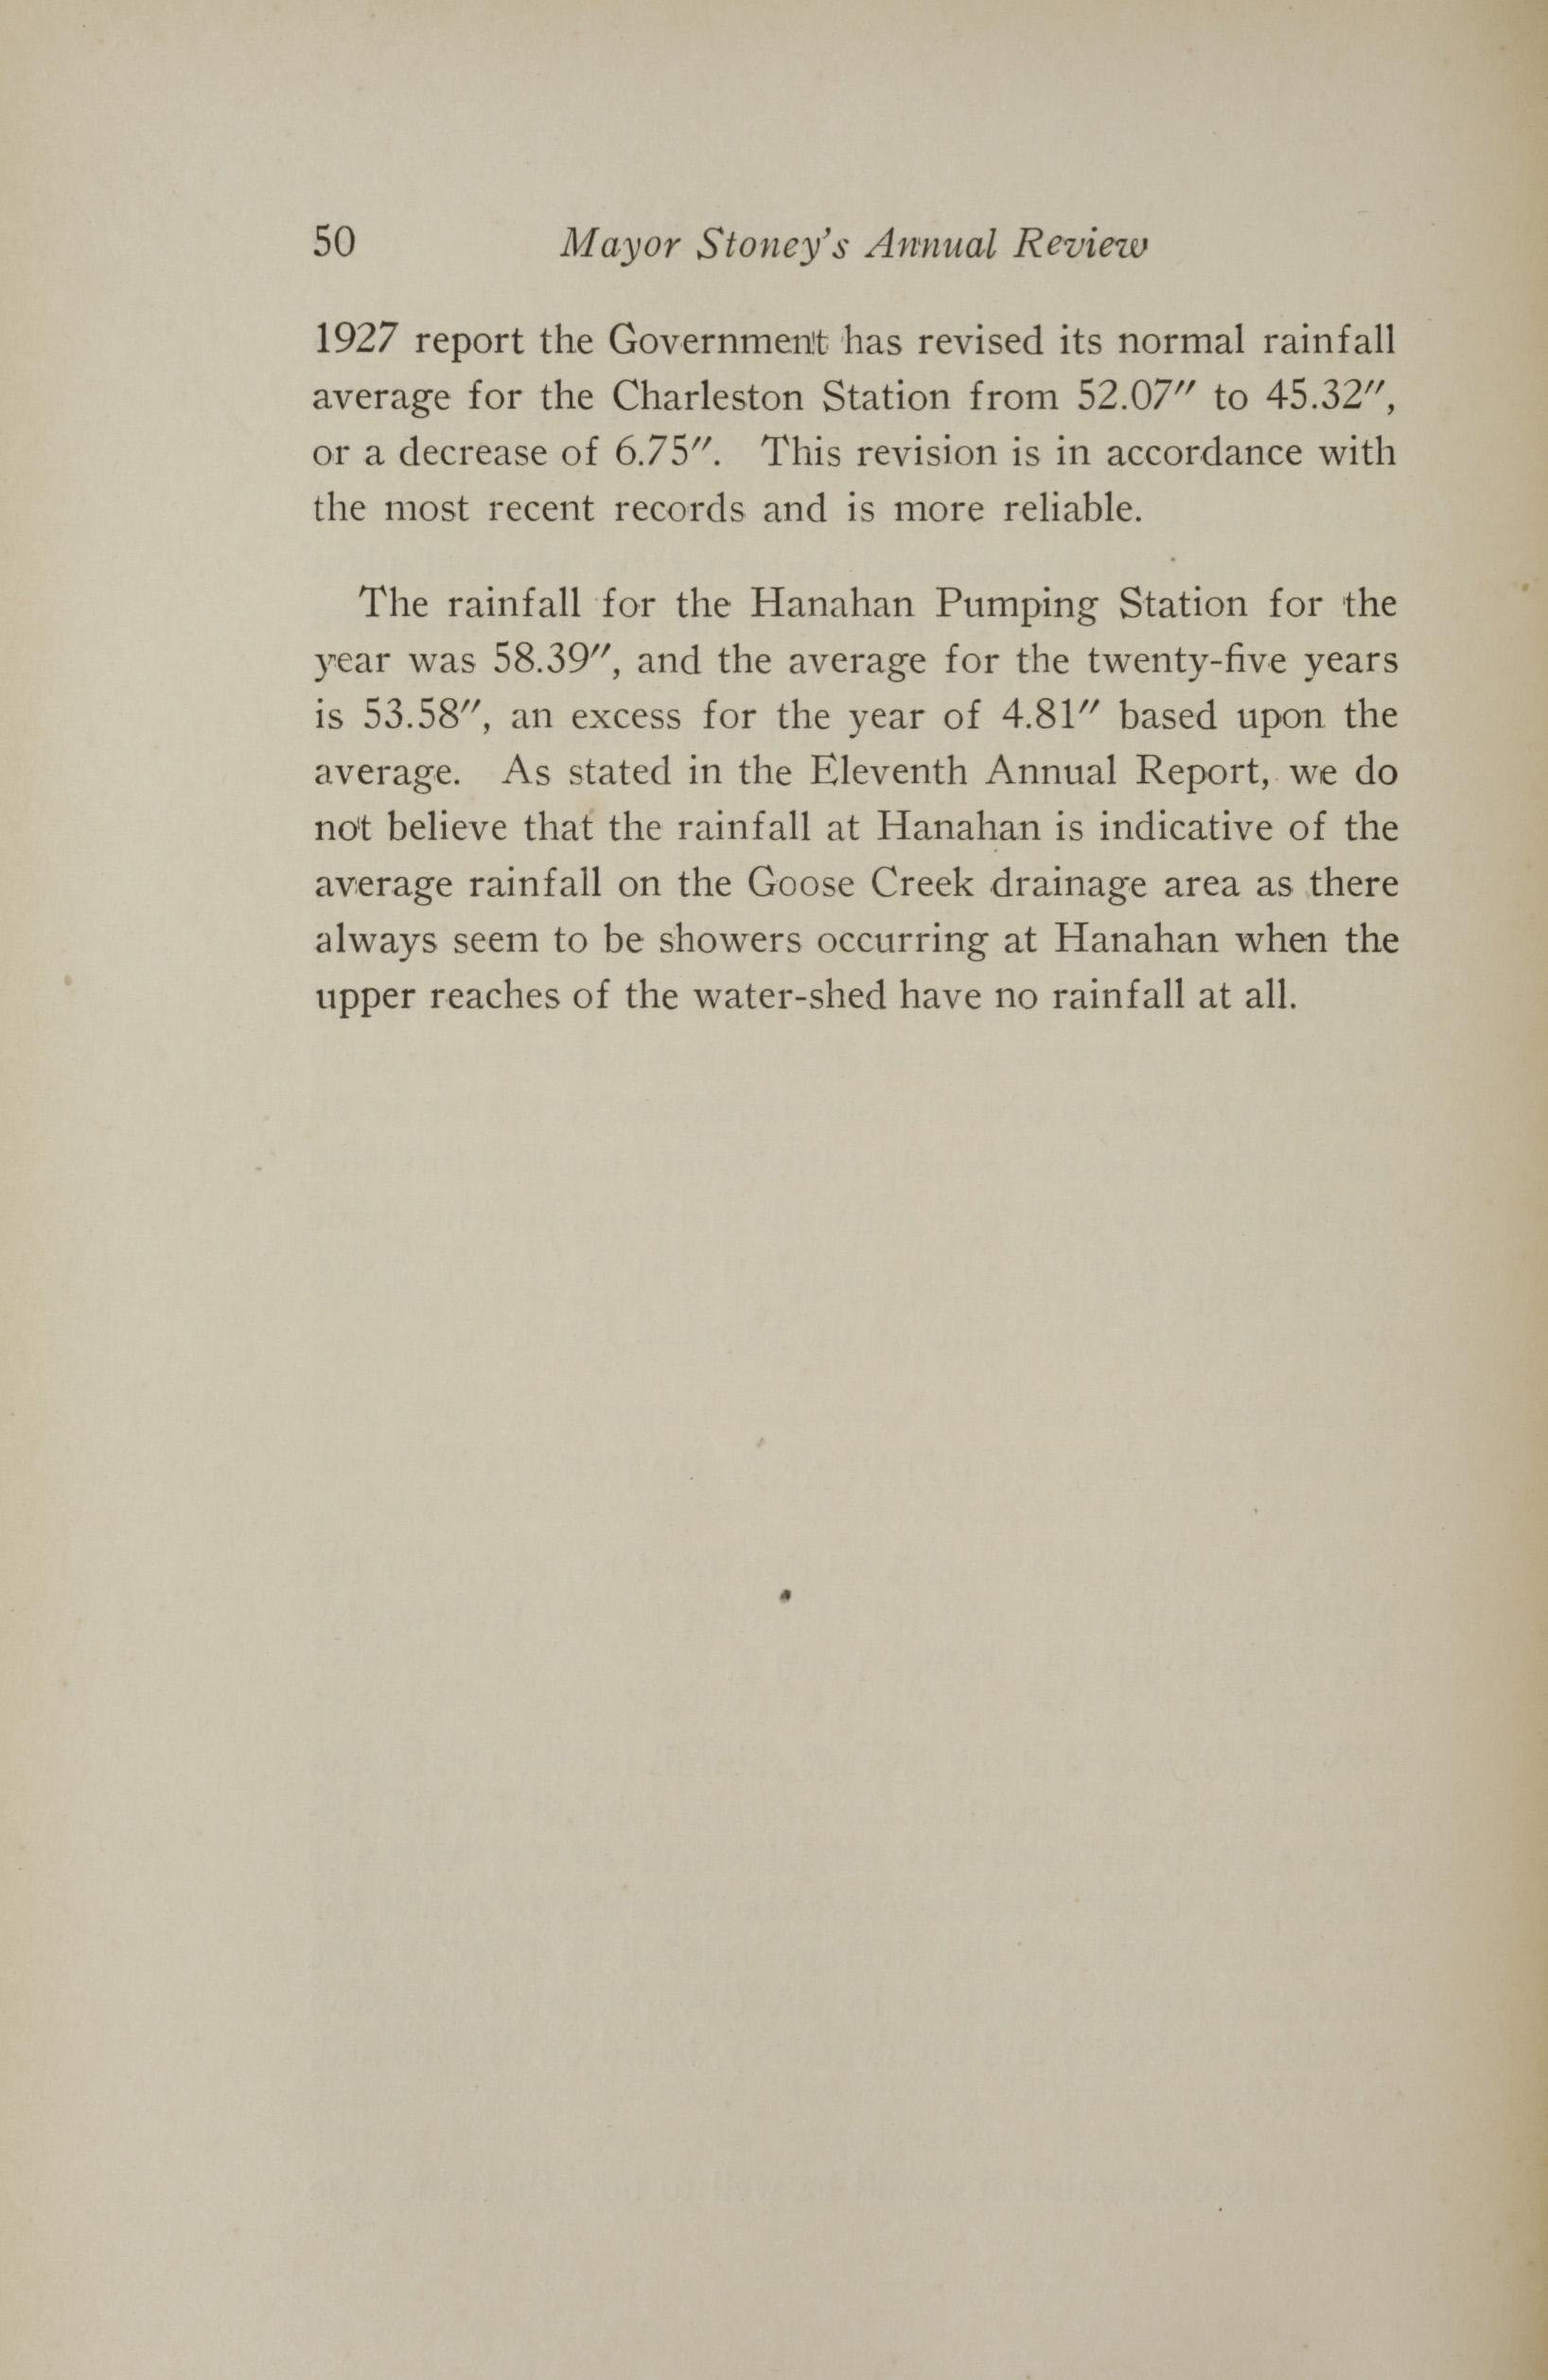 Charleston Yearbook, 1928, page 50